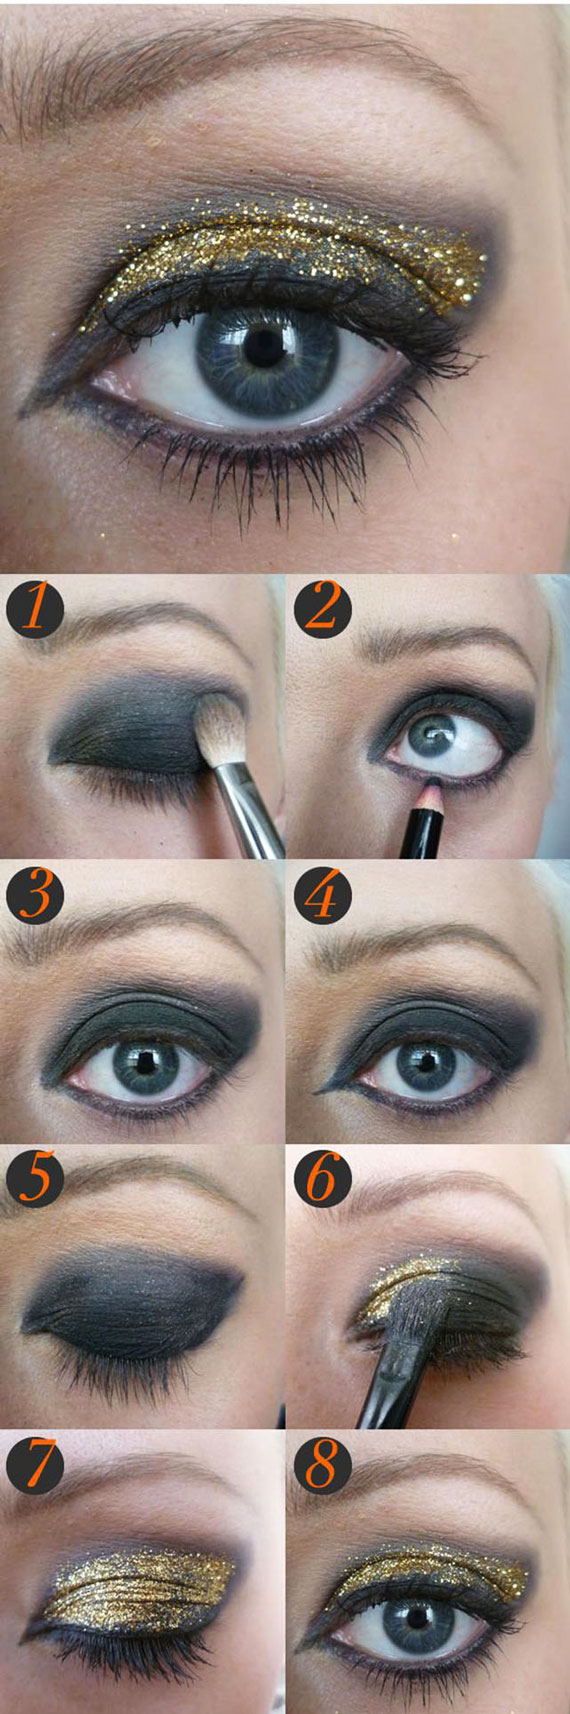 Eye-makeup-tutorial-(2)